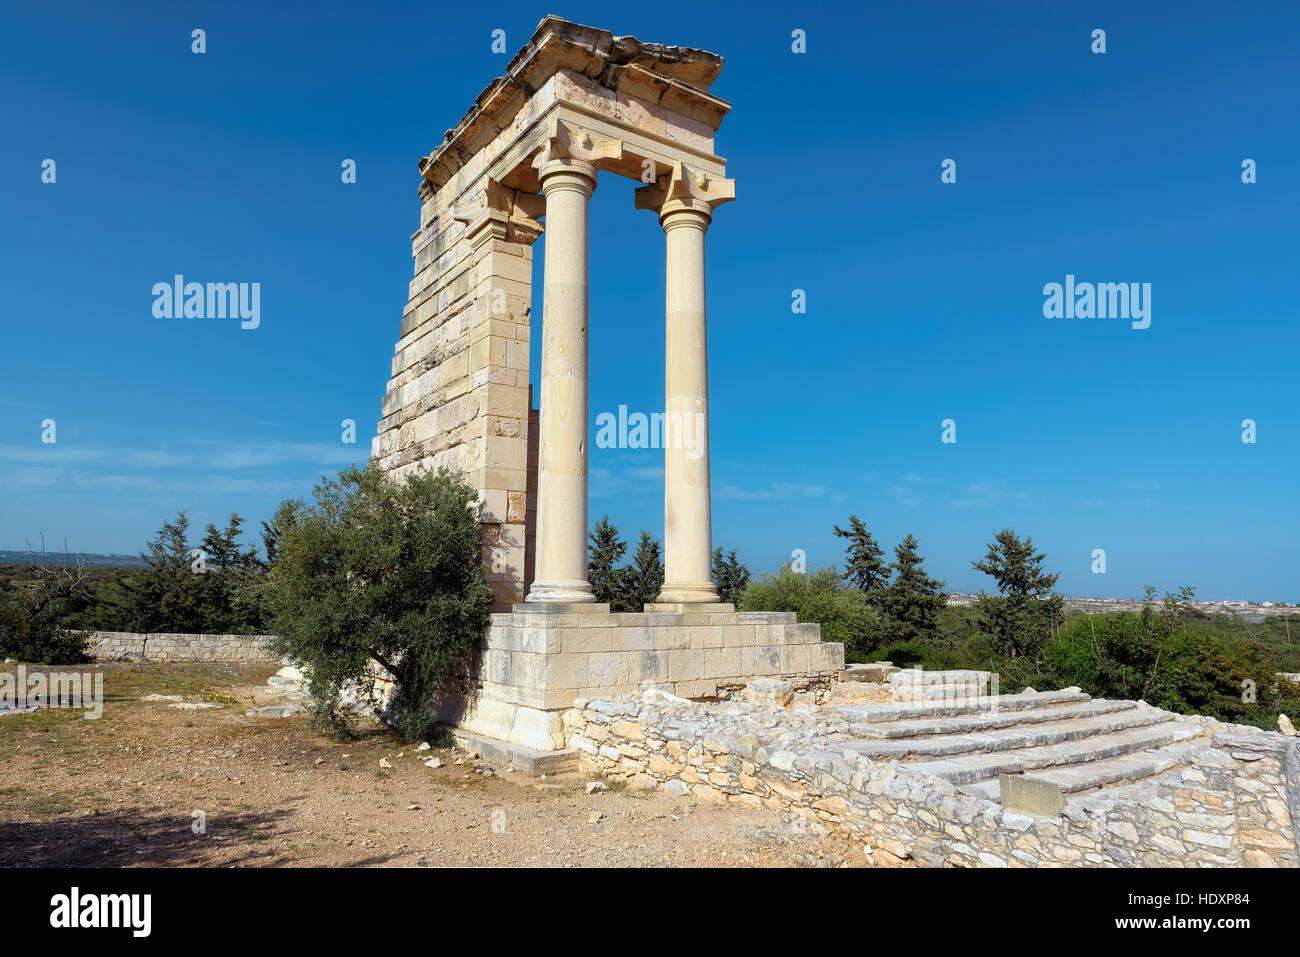 The Sanctuary of Apollo Hylates, Limassol, Cyprus - Stock Image